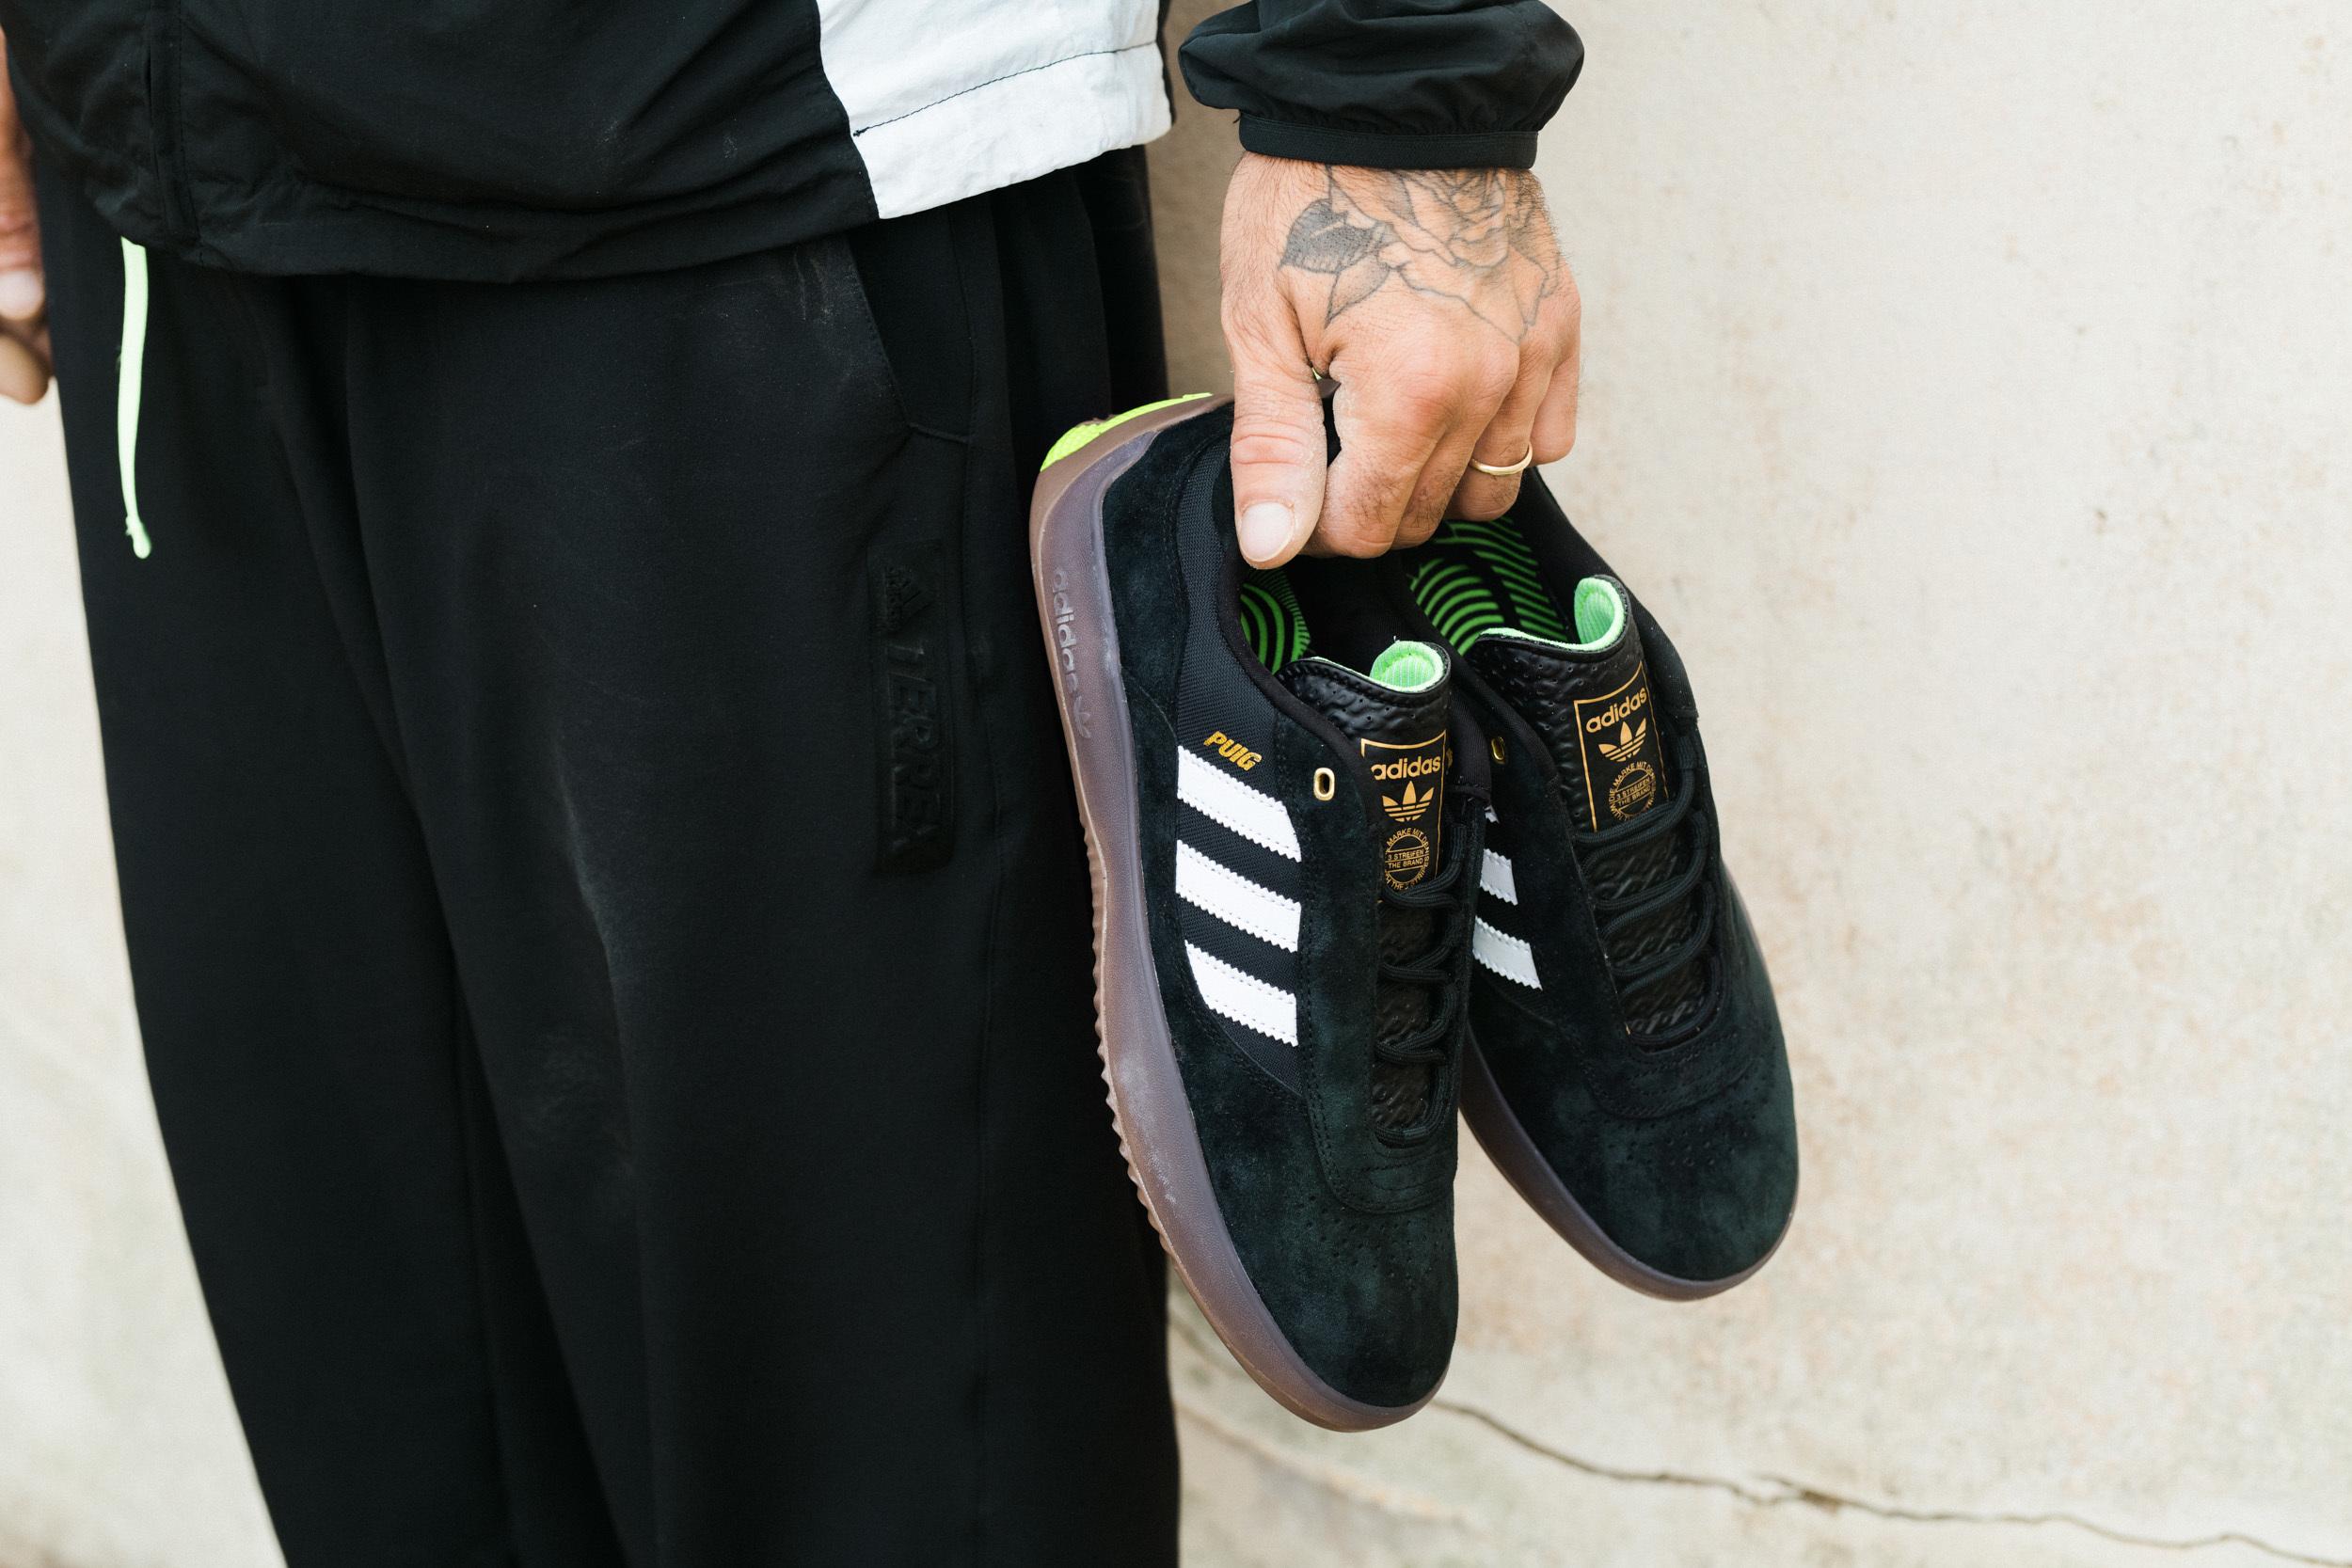 Adidas-FW20-Puig-Black-OnBody-InHands01-Color.jpg